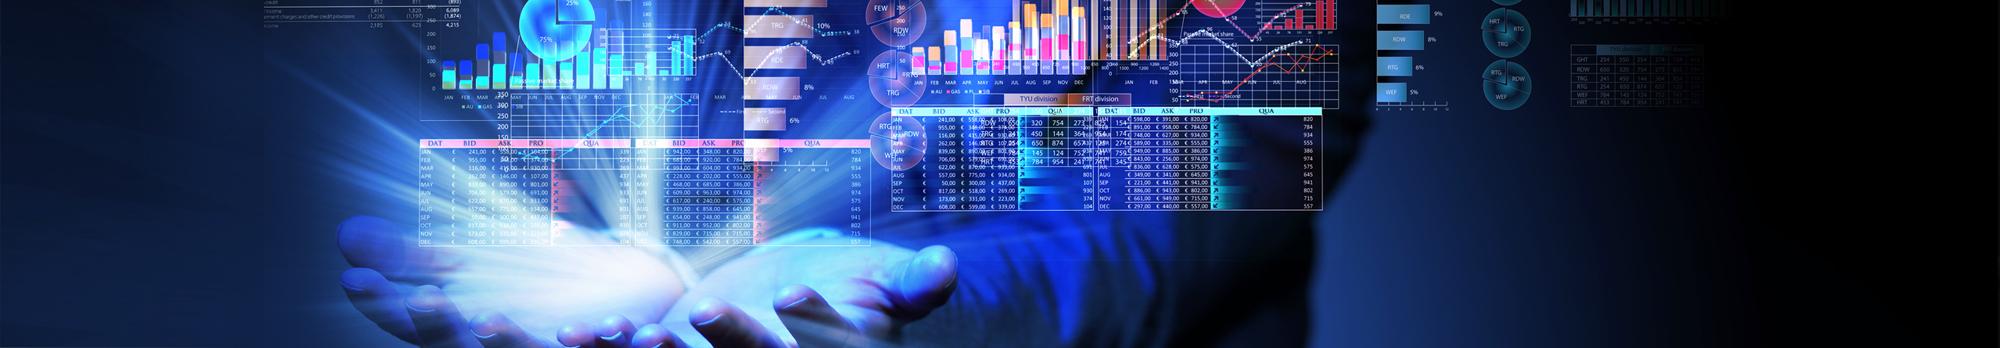 Safeguarding the 21st century's most precious asset - Acxiom